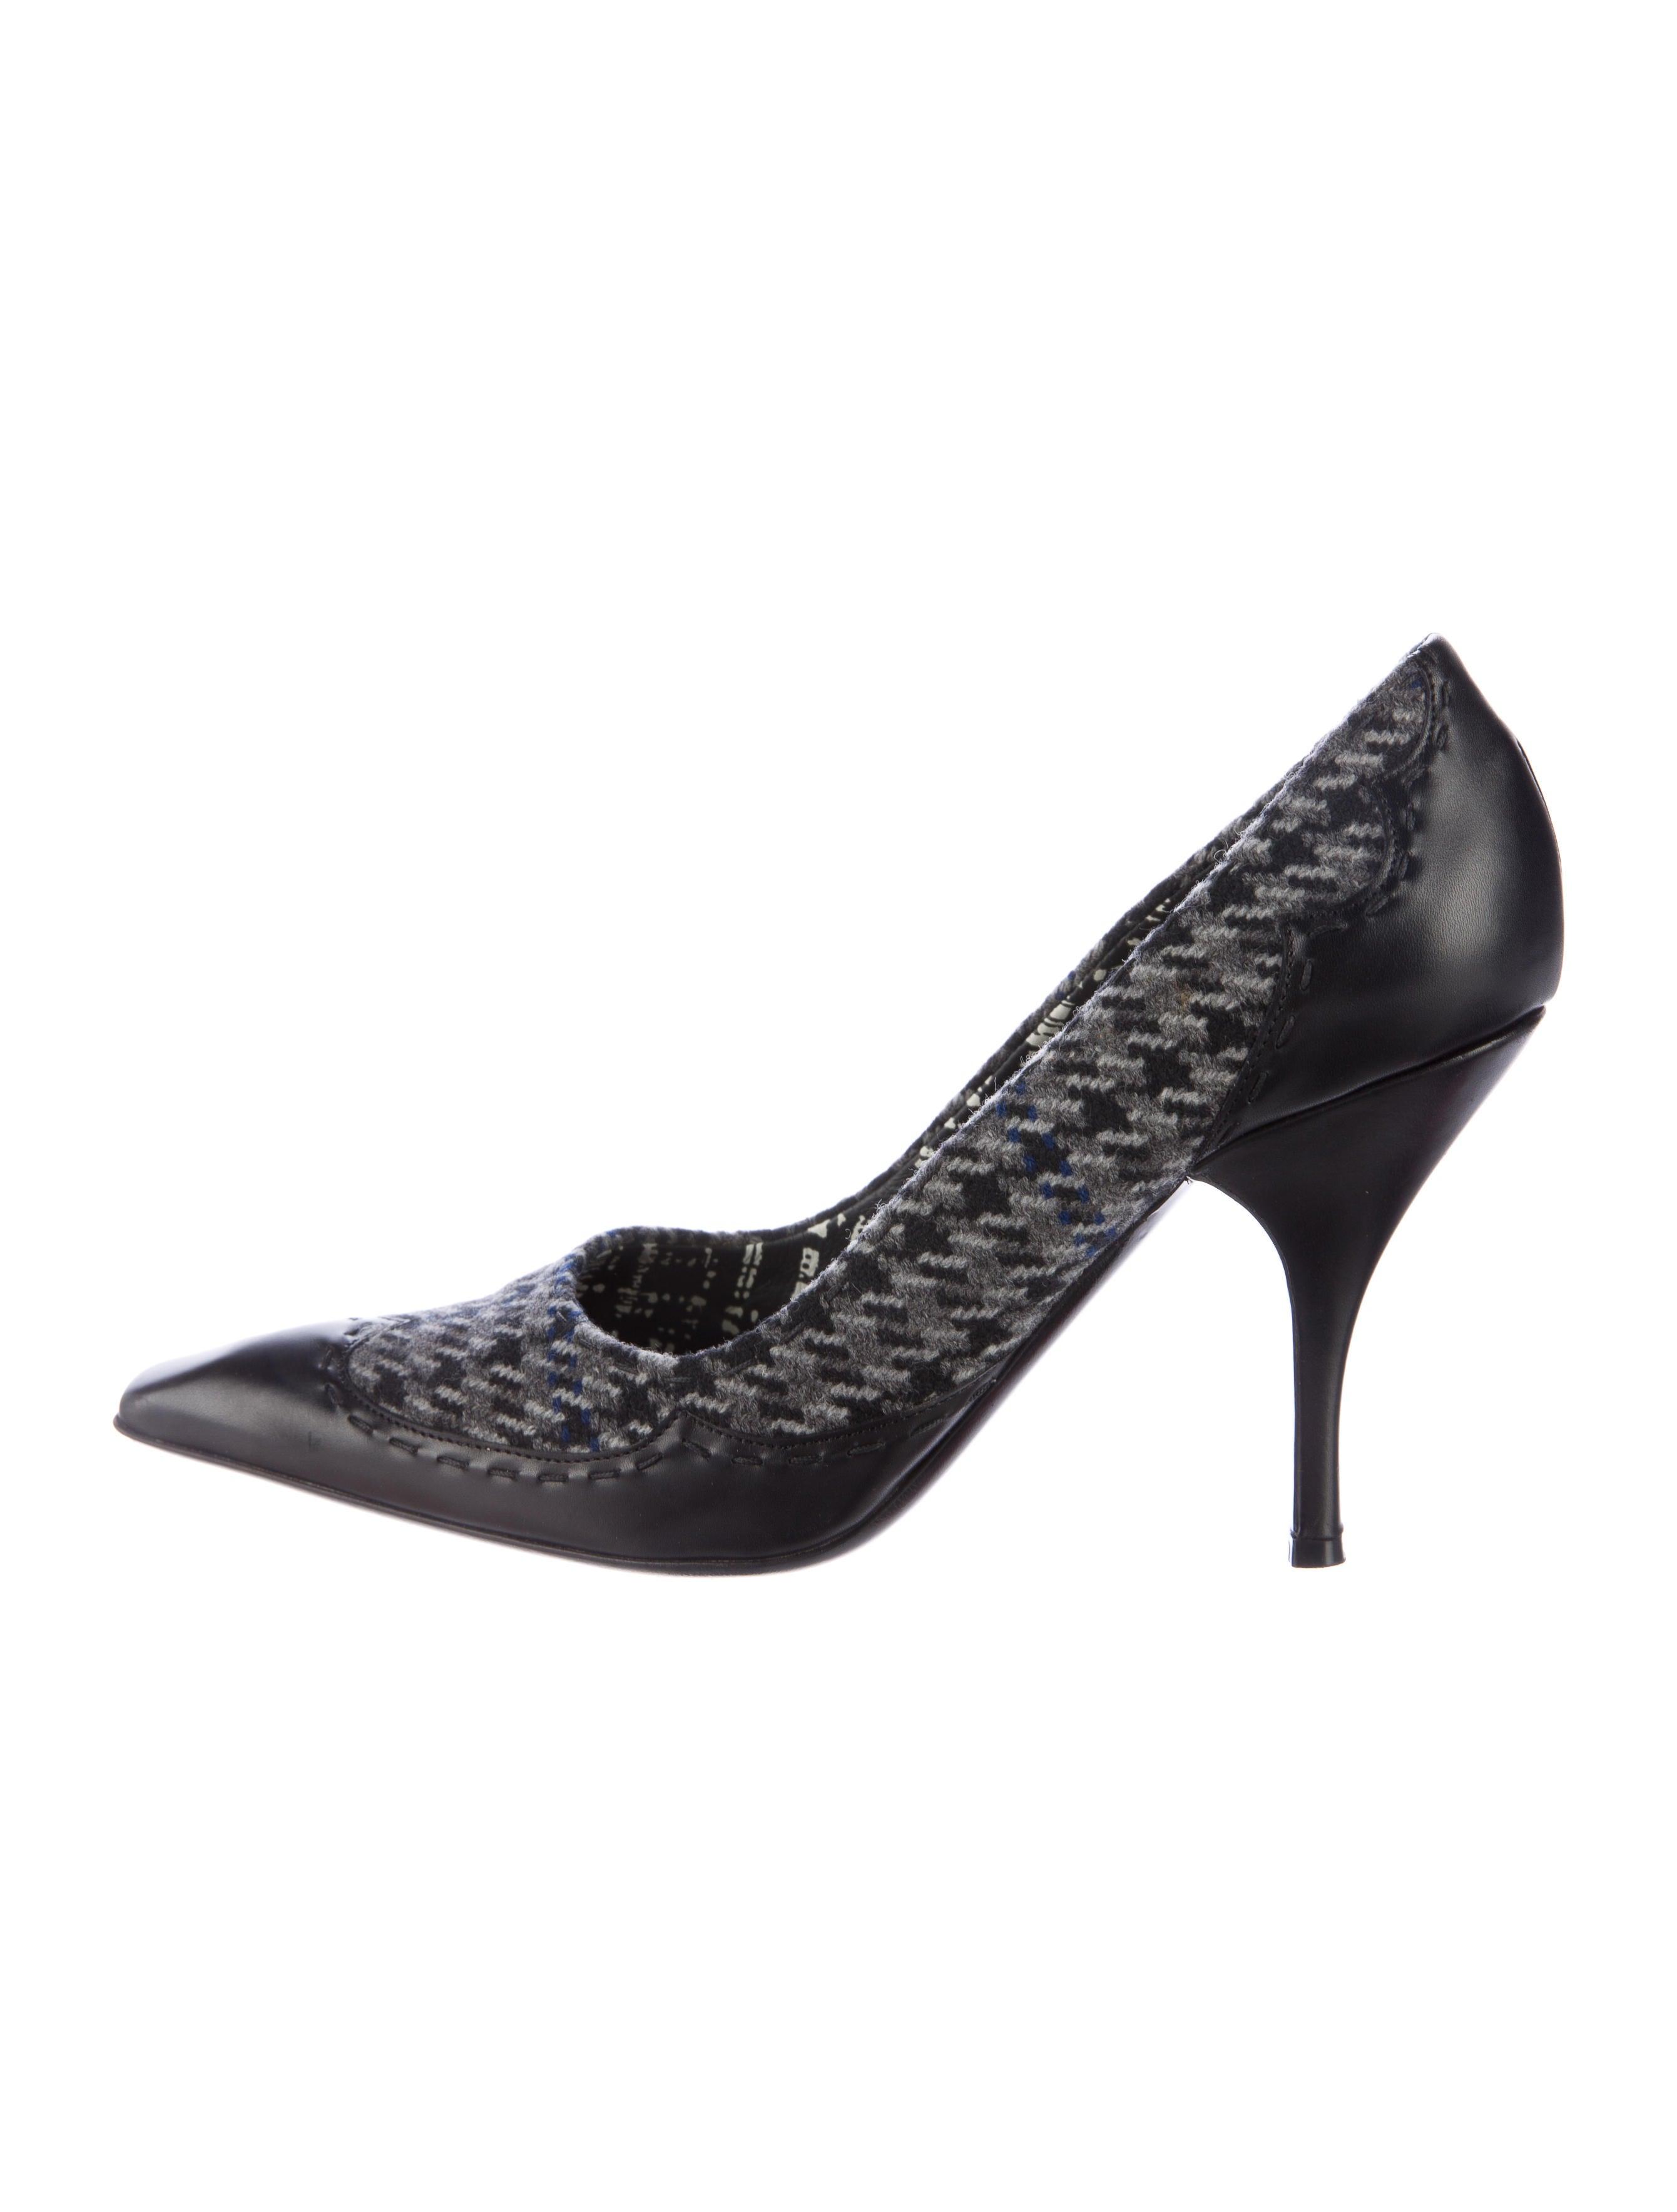 74f1d9a4a02 Prada Leather Houndstooth Pumps - Shoes - PRA145963